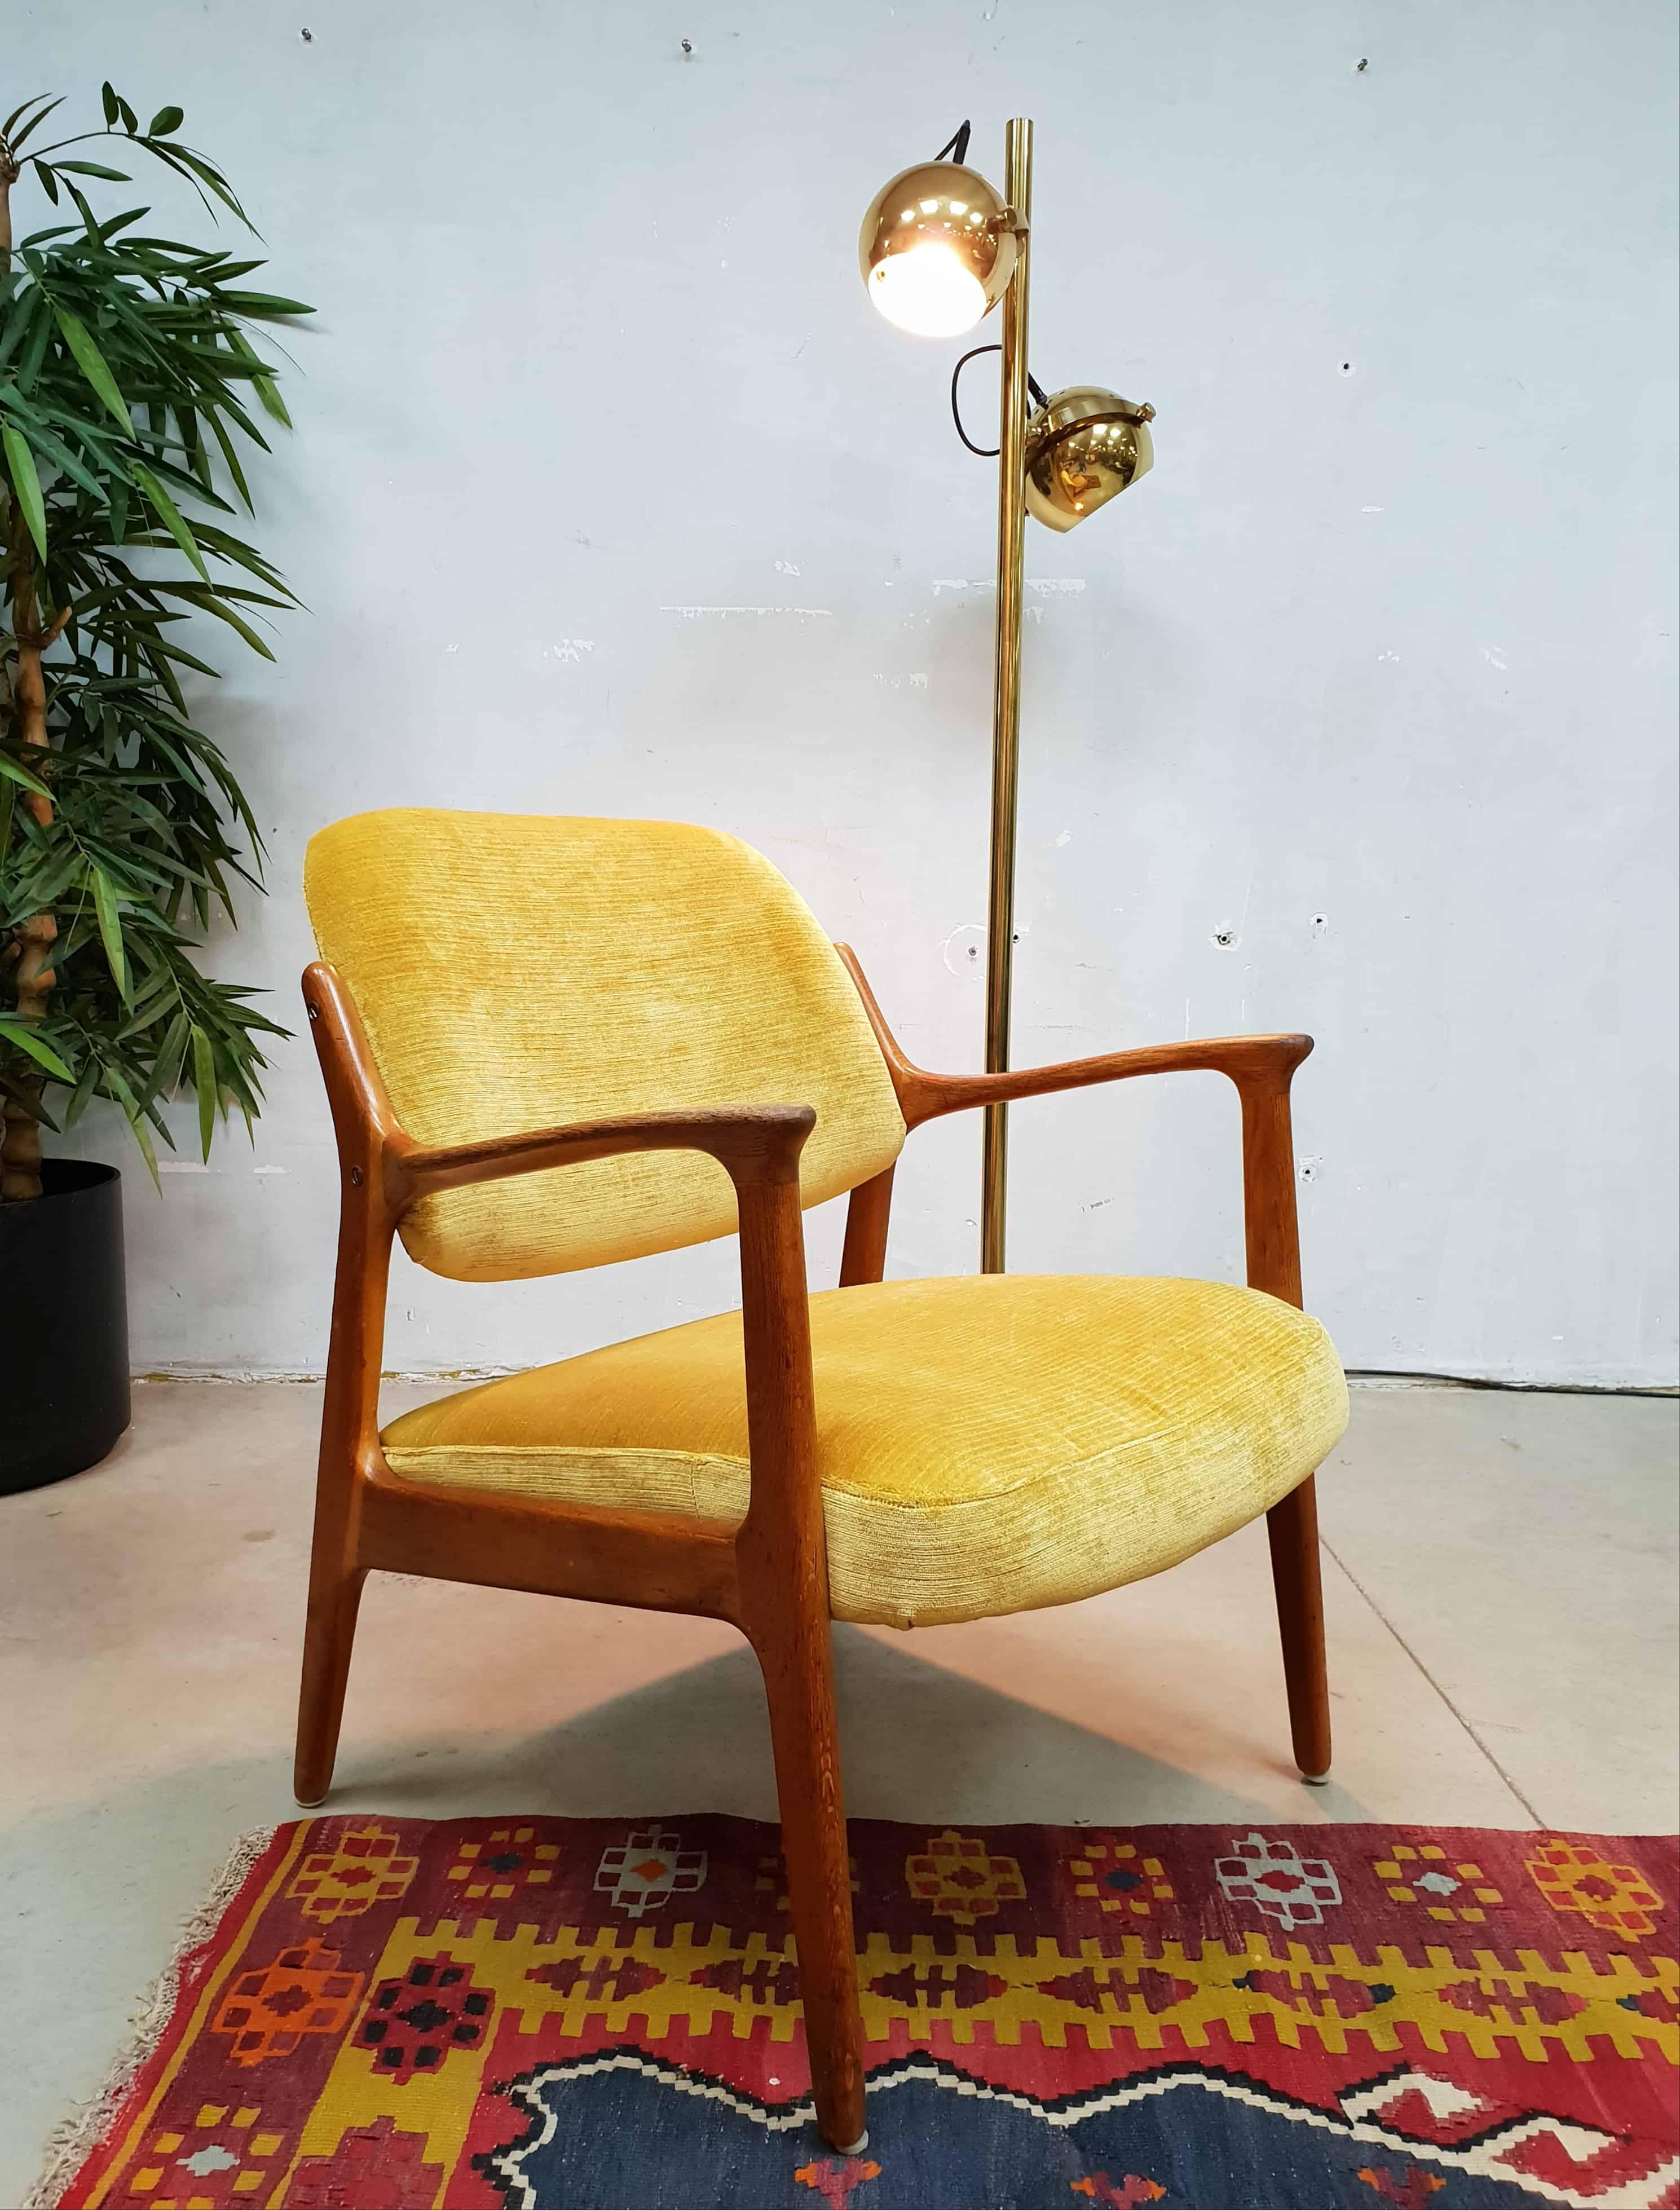 Swell Vintage Danish Scandinavian Armchair Lounge Chair Fifties Frankydiablos Diy Chair Ideas Frankydiabloscom